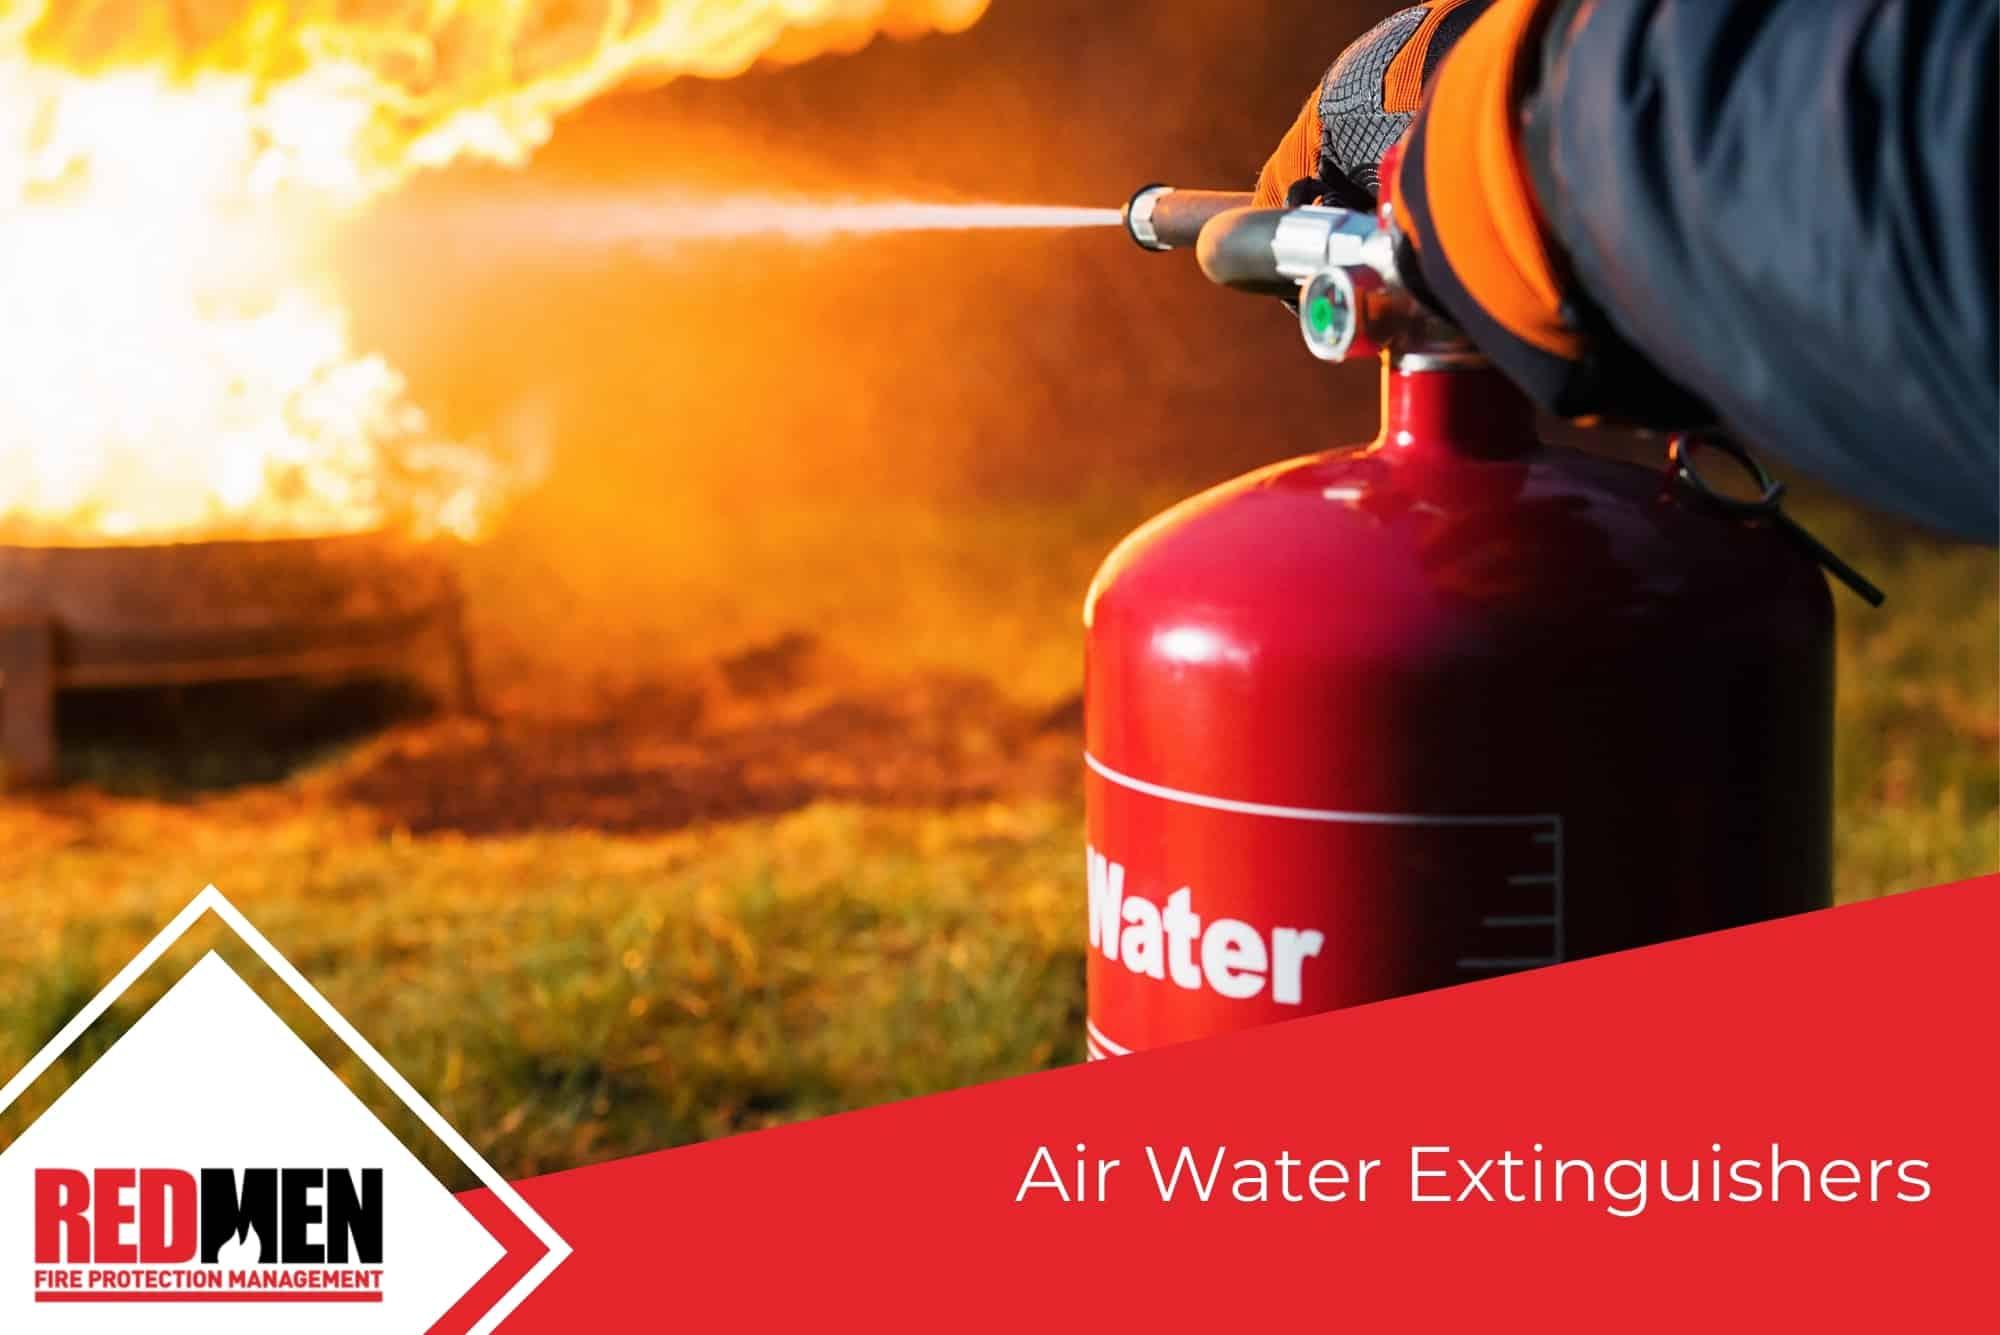 Air Water Extinguishers